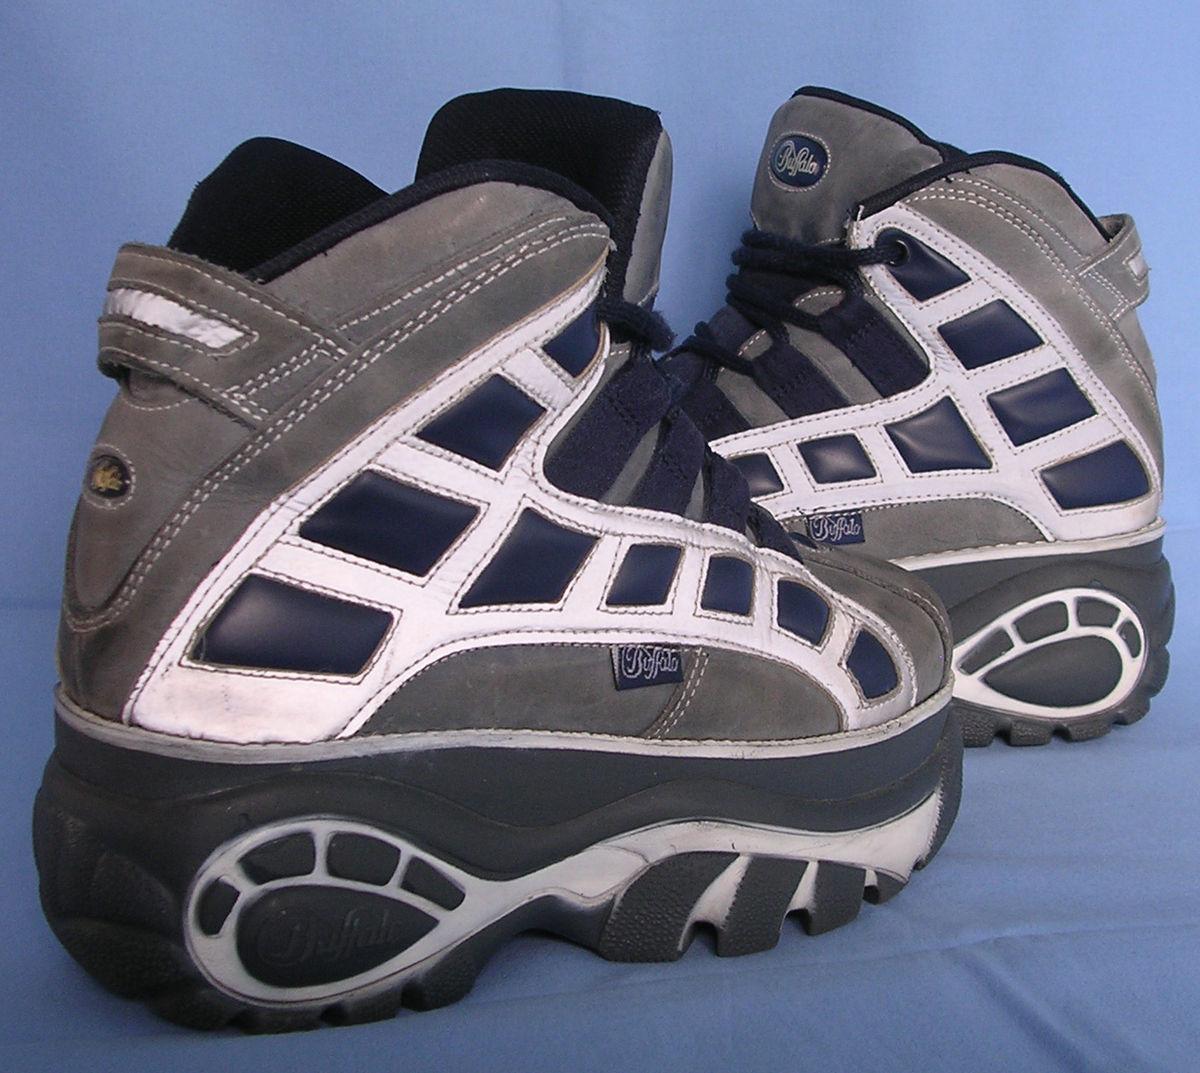 adidas anni 90 scarpe